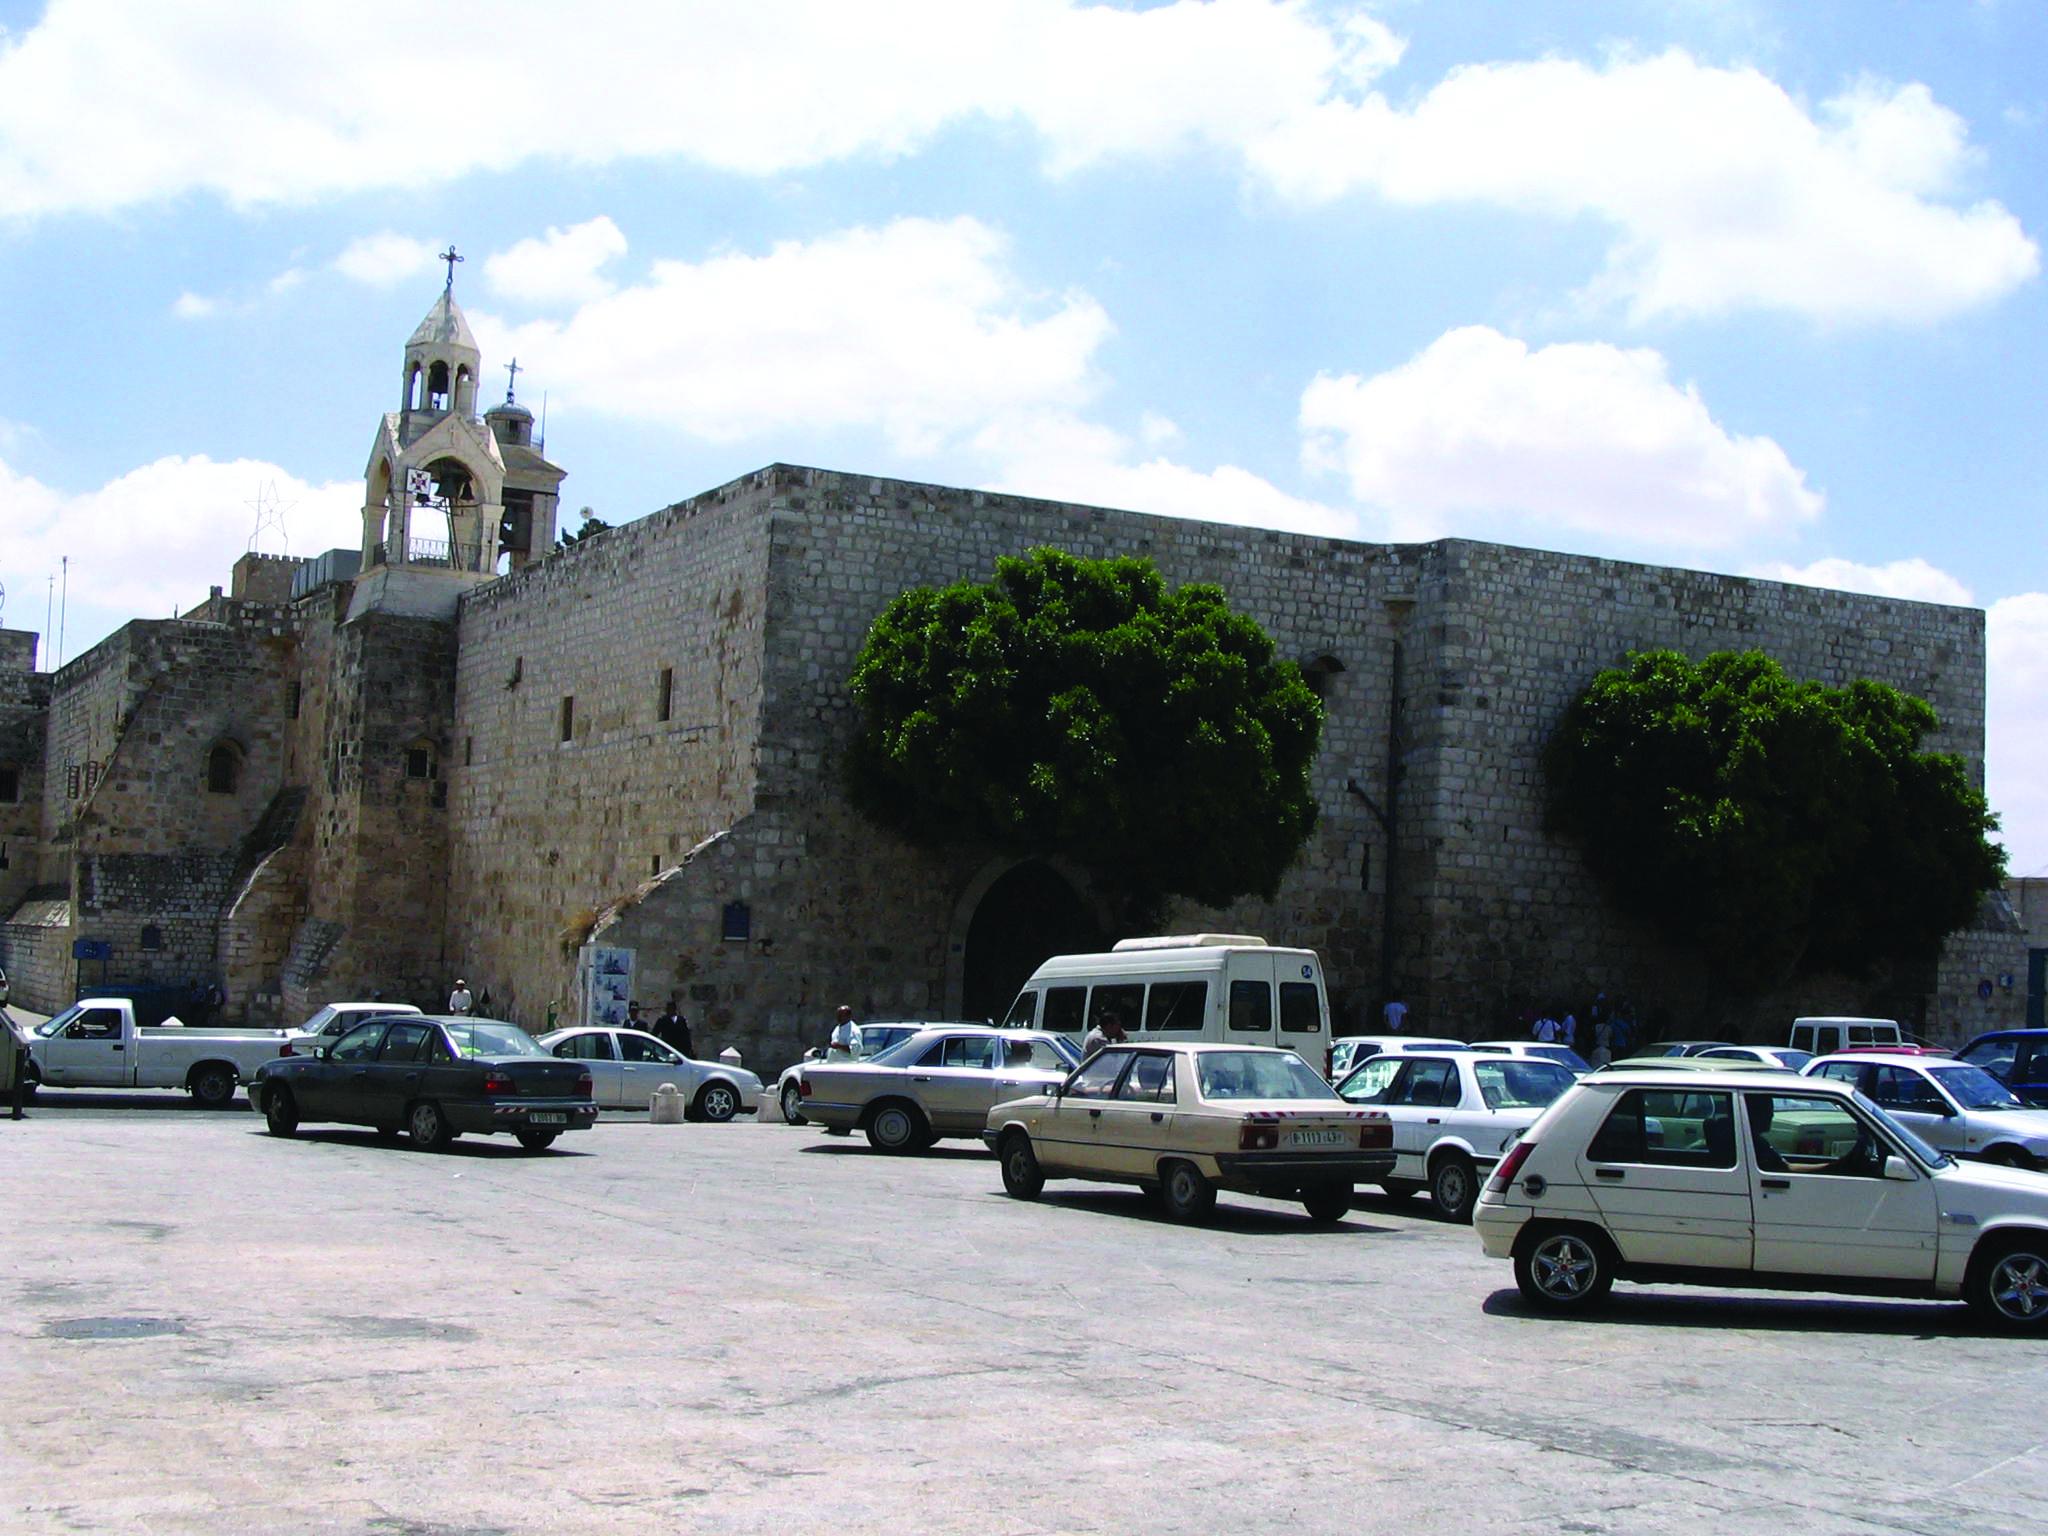 Church Of The Nativity In Bethlehem Israel